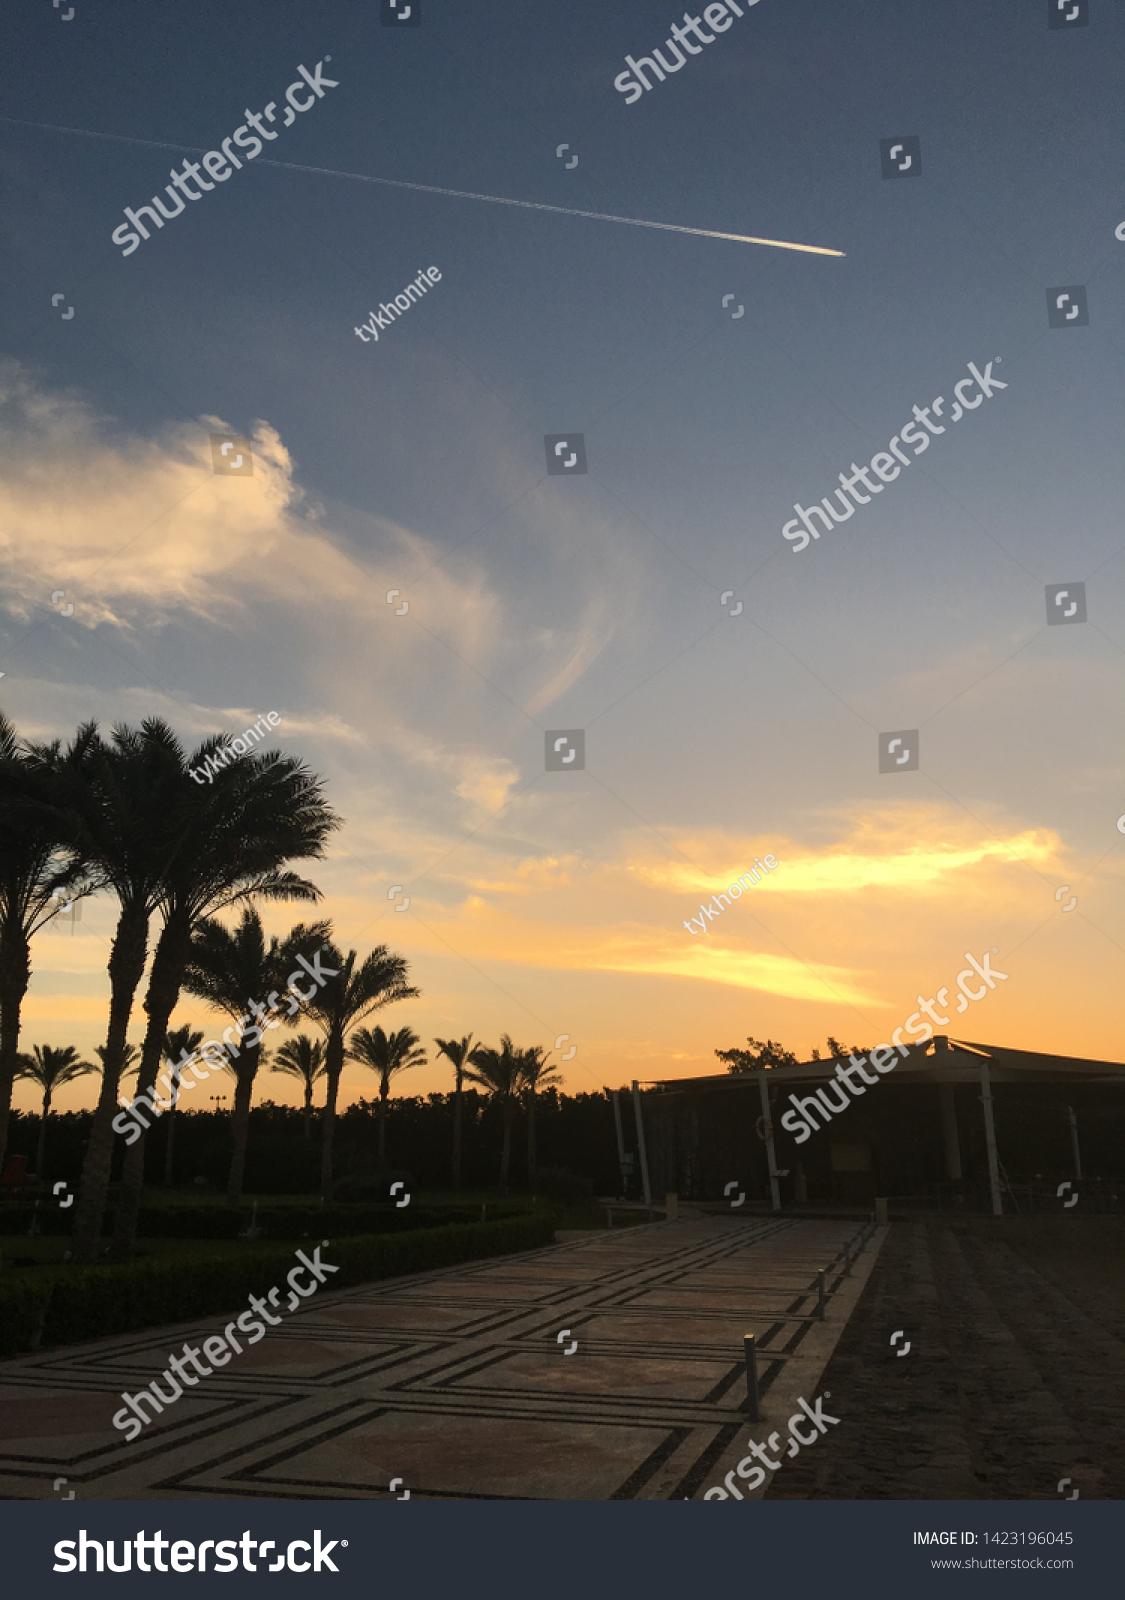 stock-photo-tropical-sunset-beach-yellow